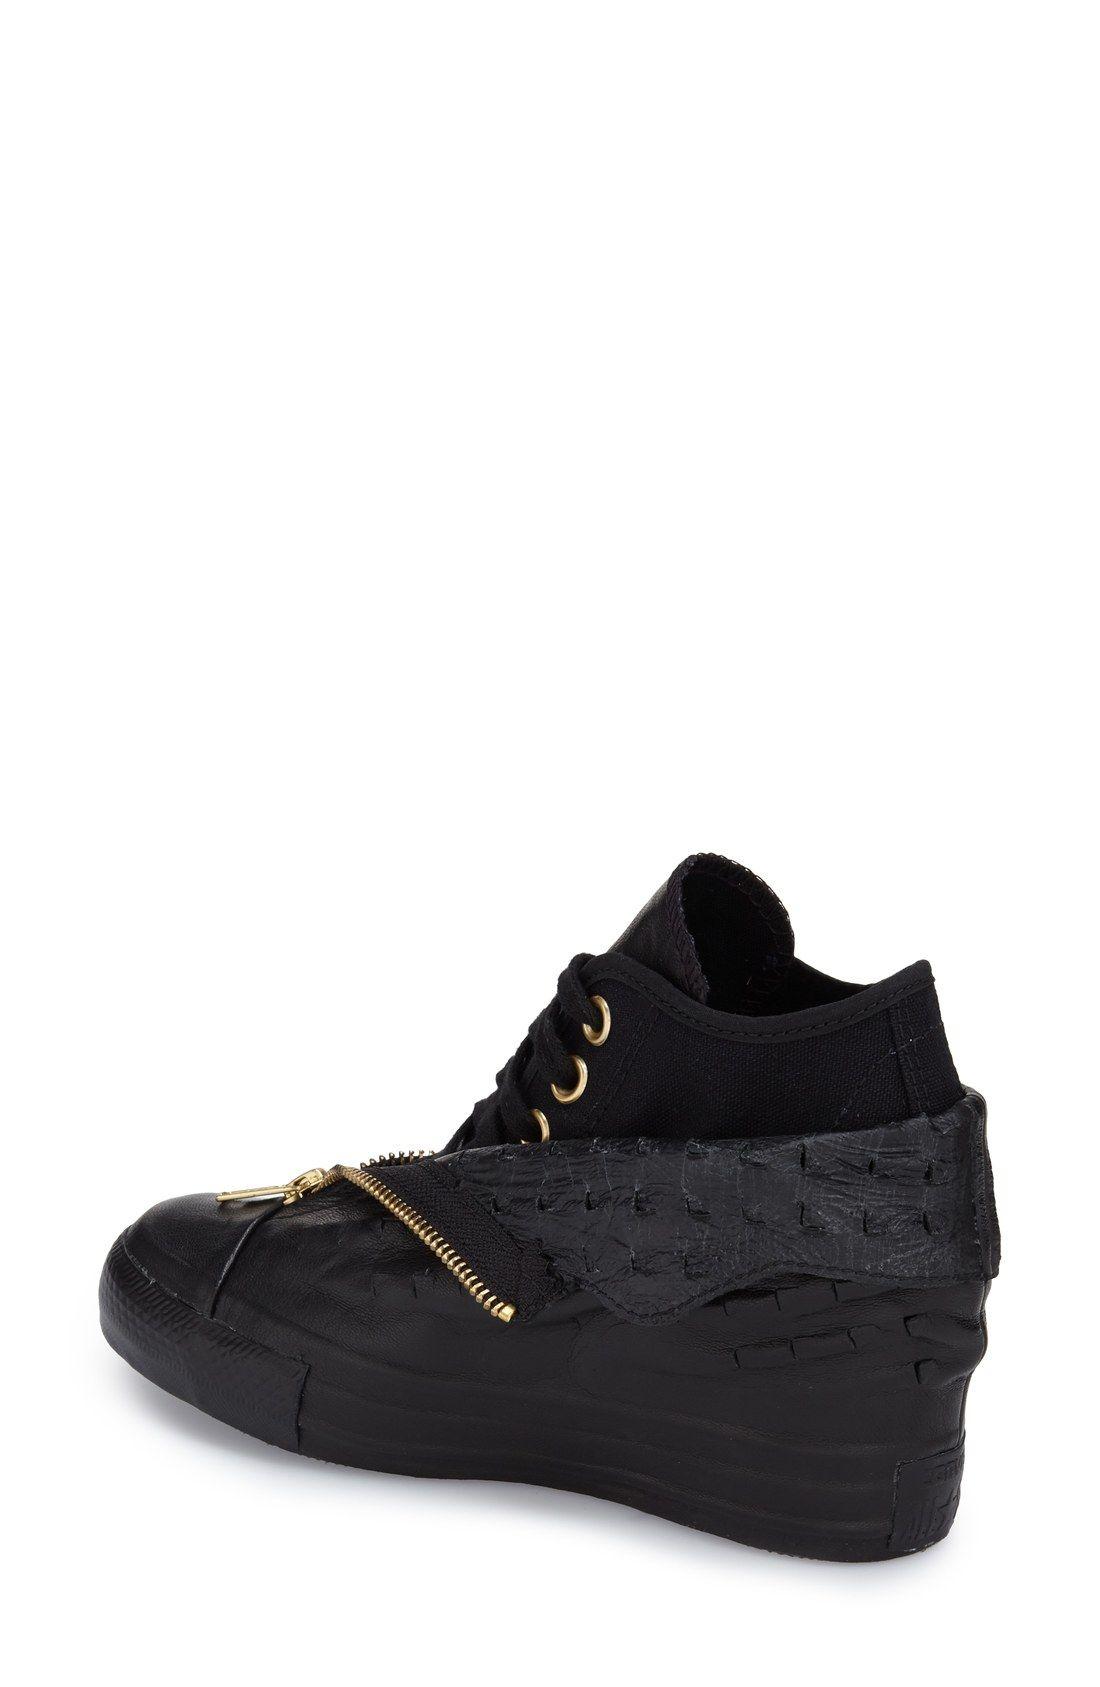 811e85dd41d1 Converse Chuck Taylor® All Star®  Lux Shroud  High Top Wedge Sneaker (Women)